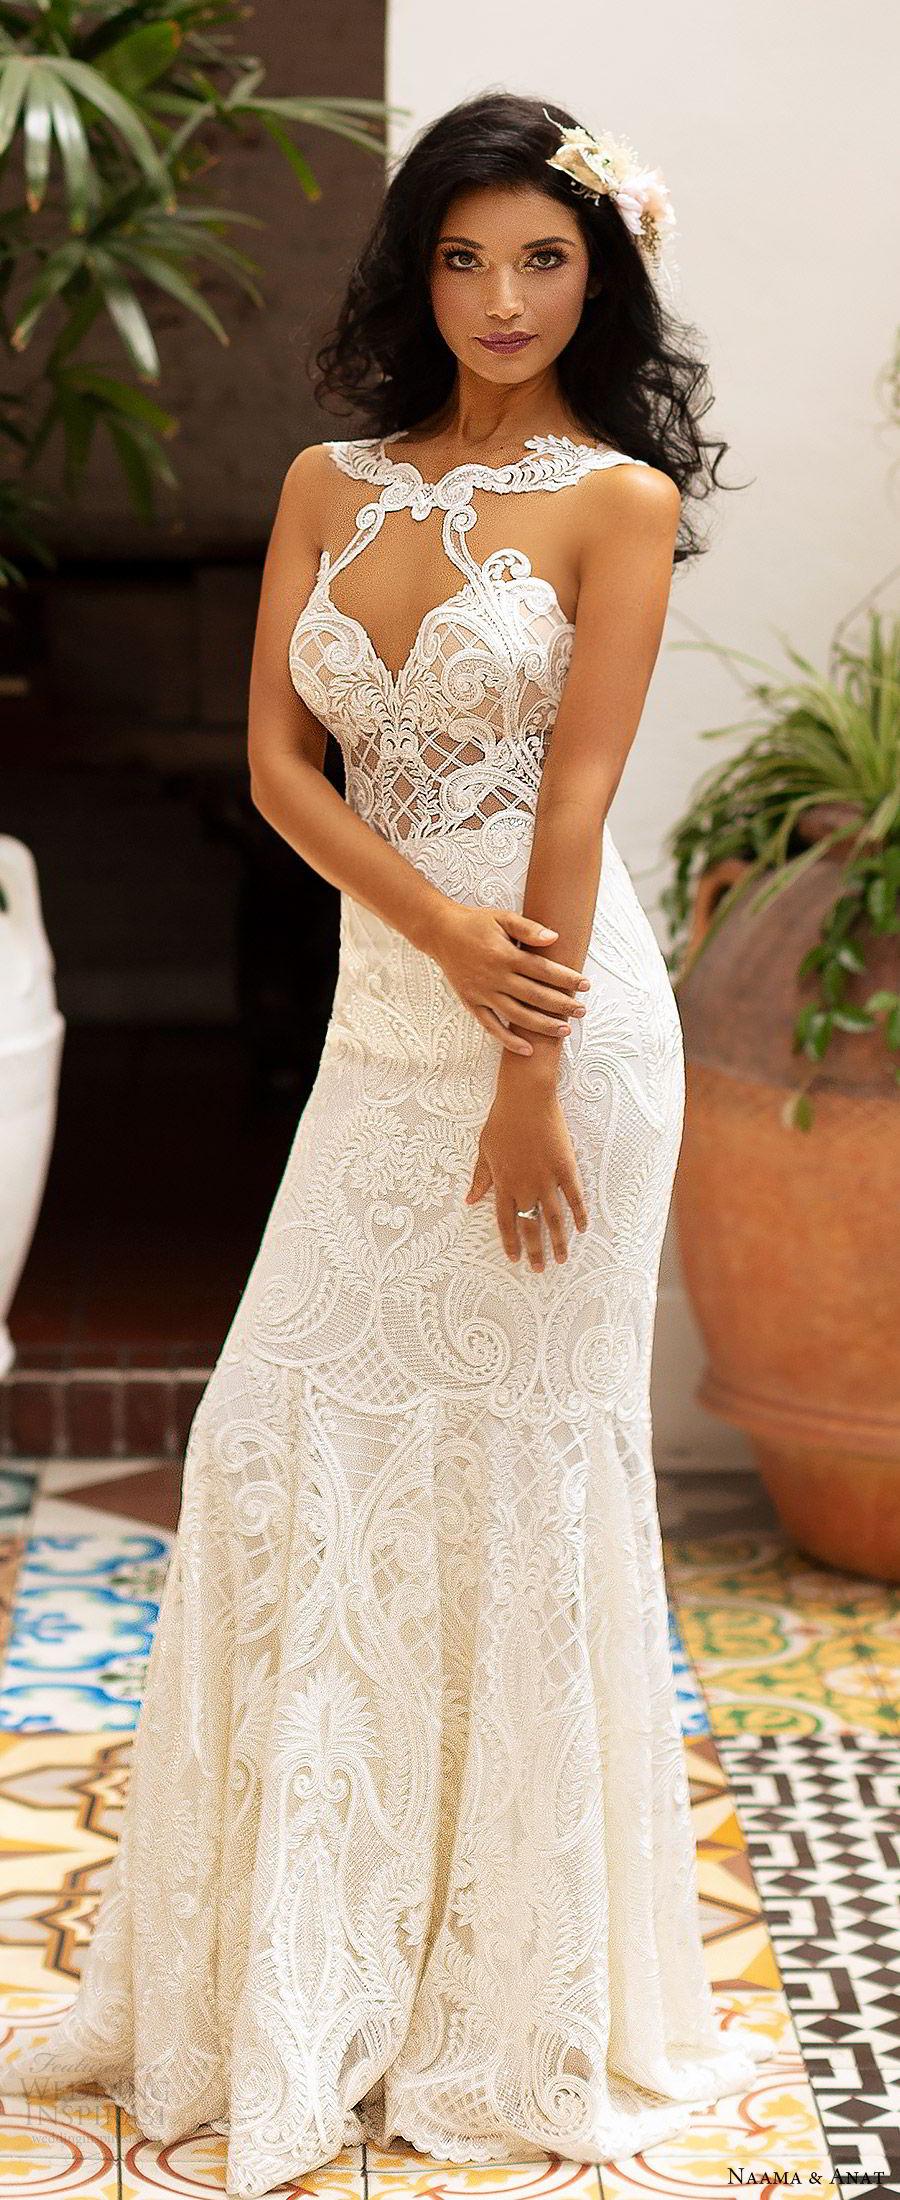 naama anat 2019 bridal sleeveless sweetheart neckline cutout bodice lace fit flare aline wedding dress illusion back sweep train sexy modern (5) zv